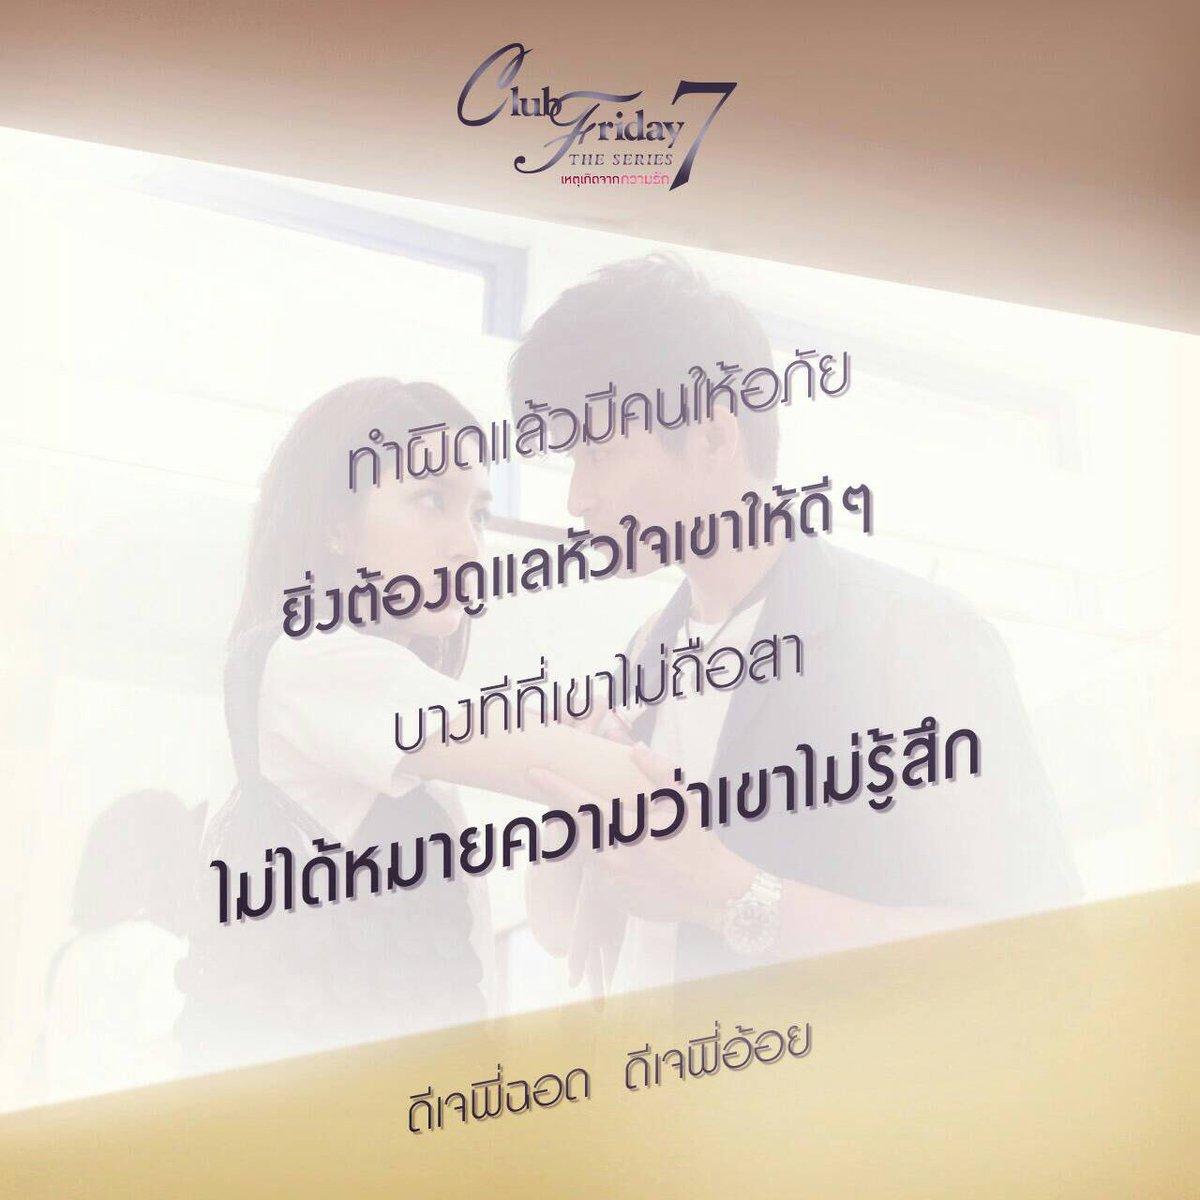 #ClubFridayTheSeries7  #เหตุเกิดจากความรัก ตอน #รักลองใจ  #GMM25 https://t.co/lkLVGkConB